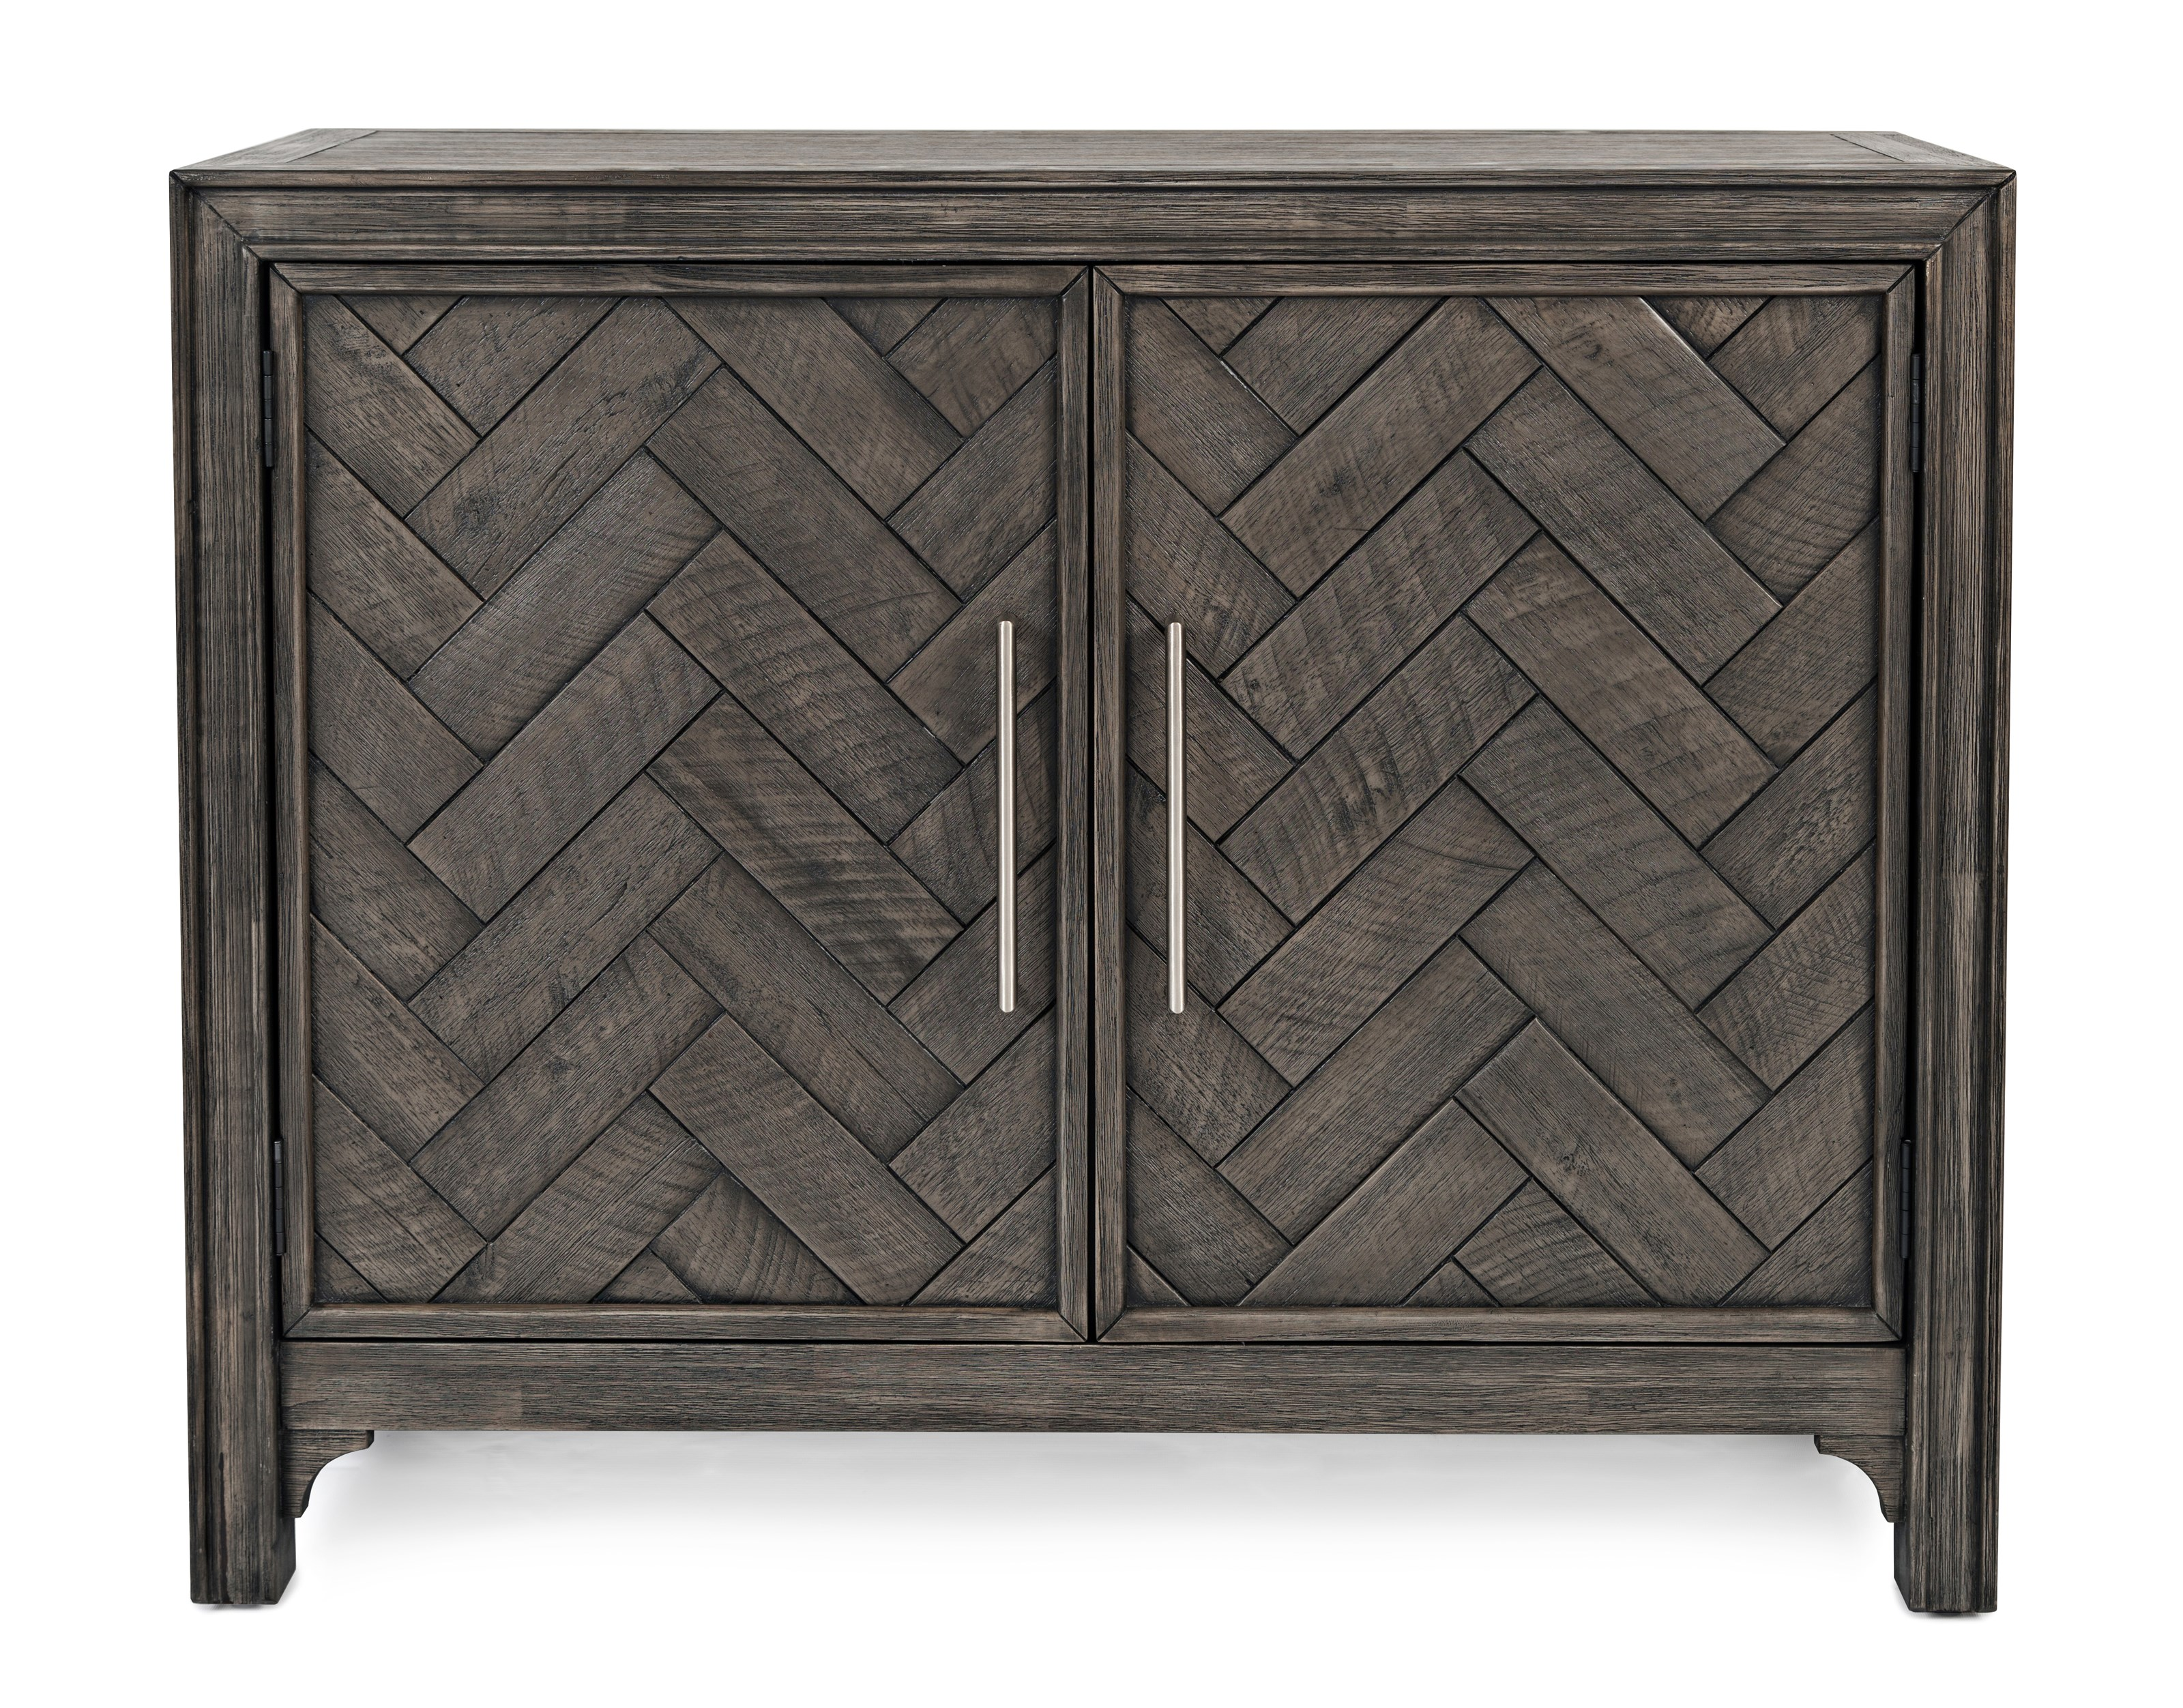 Gramercy Chevron Accent Cabinet by Jofran at Mueller Furniture